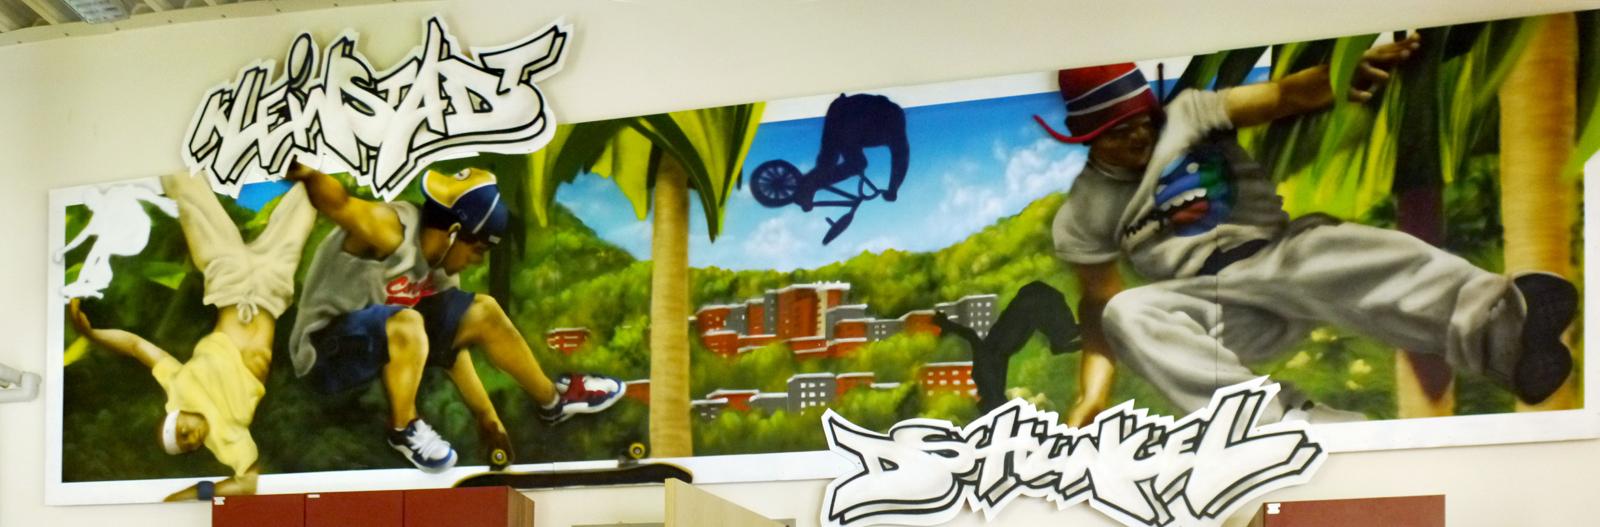 Graffiti Sprayer aus Hannover gesucht - Graffitikünstler Hannover